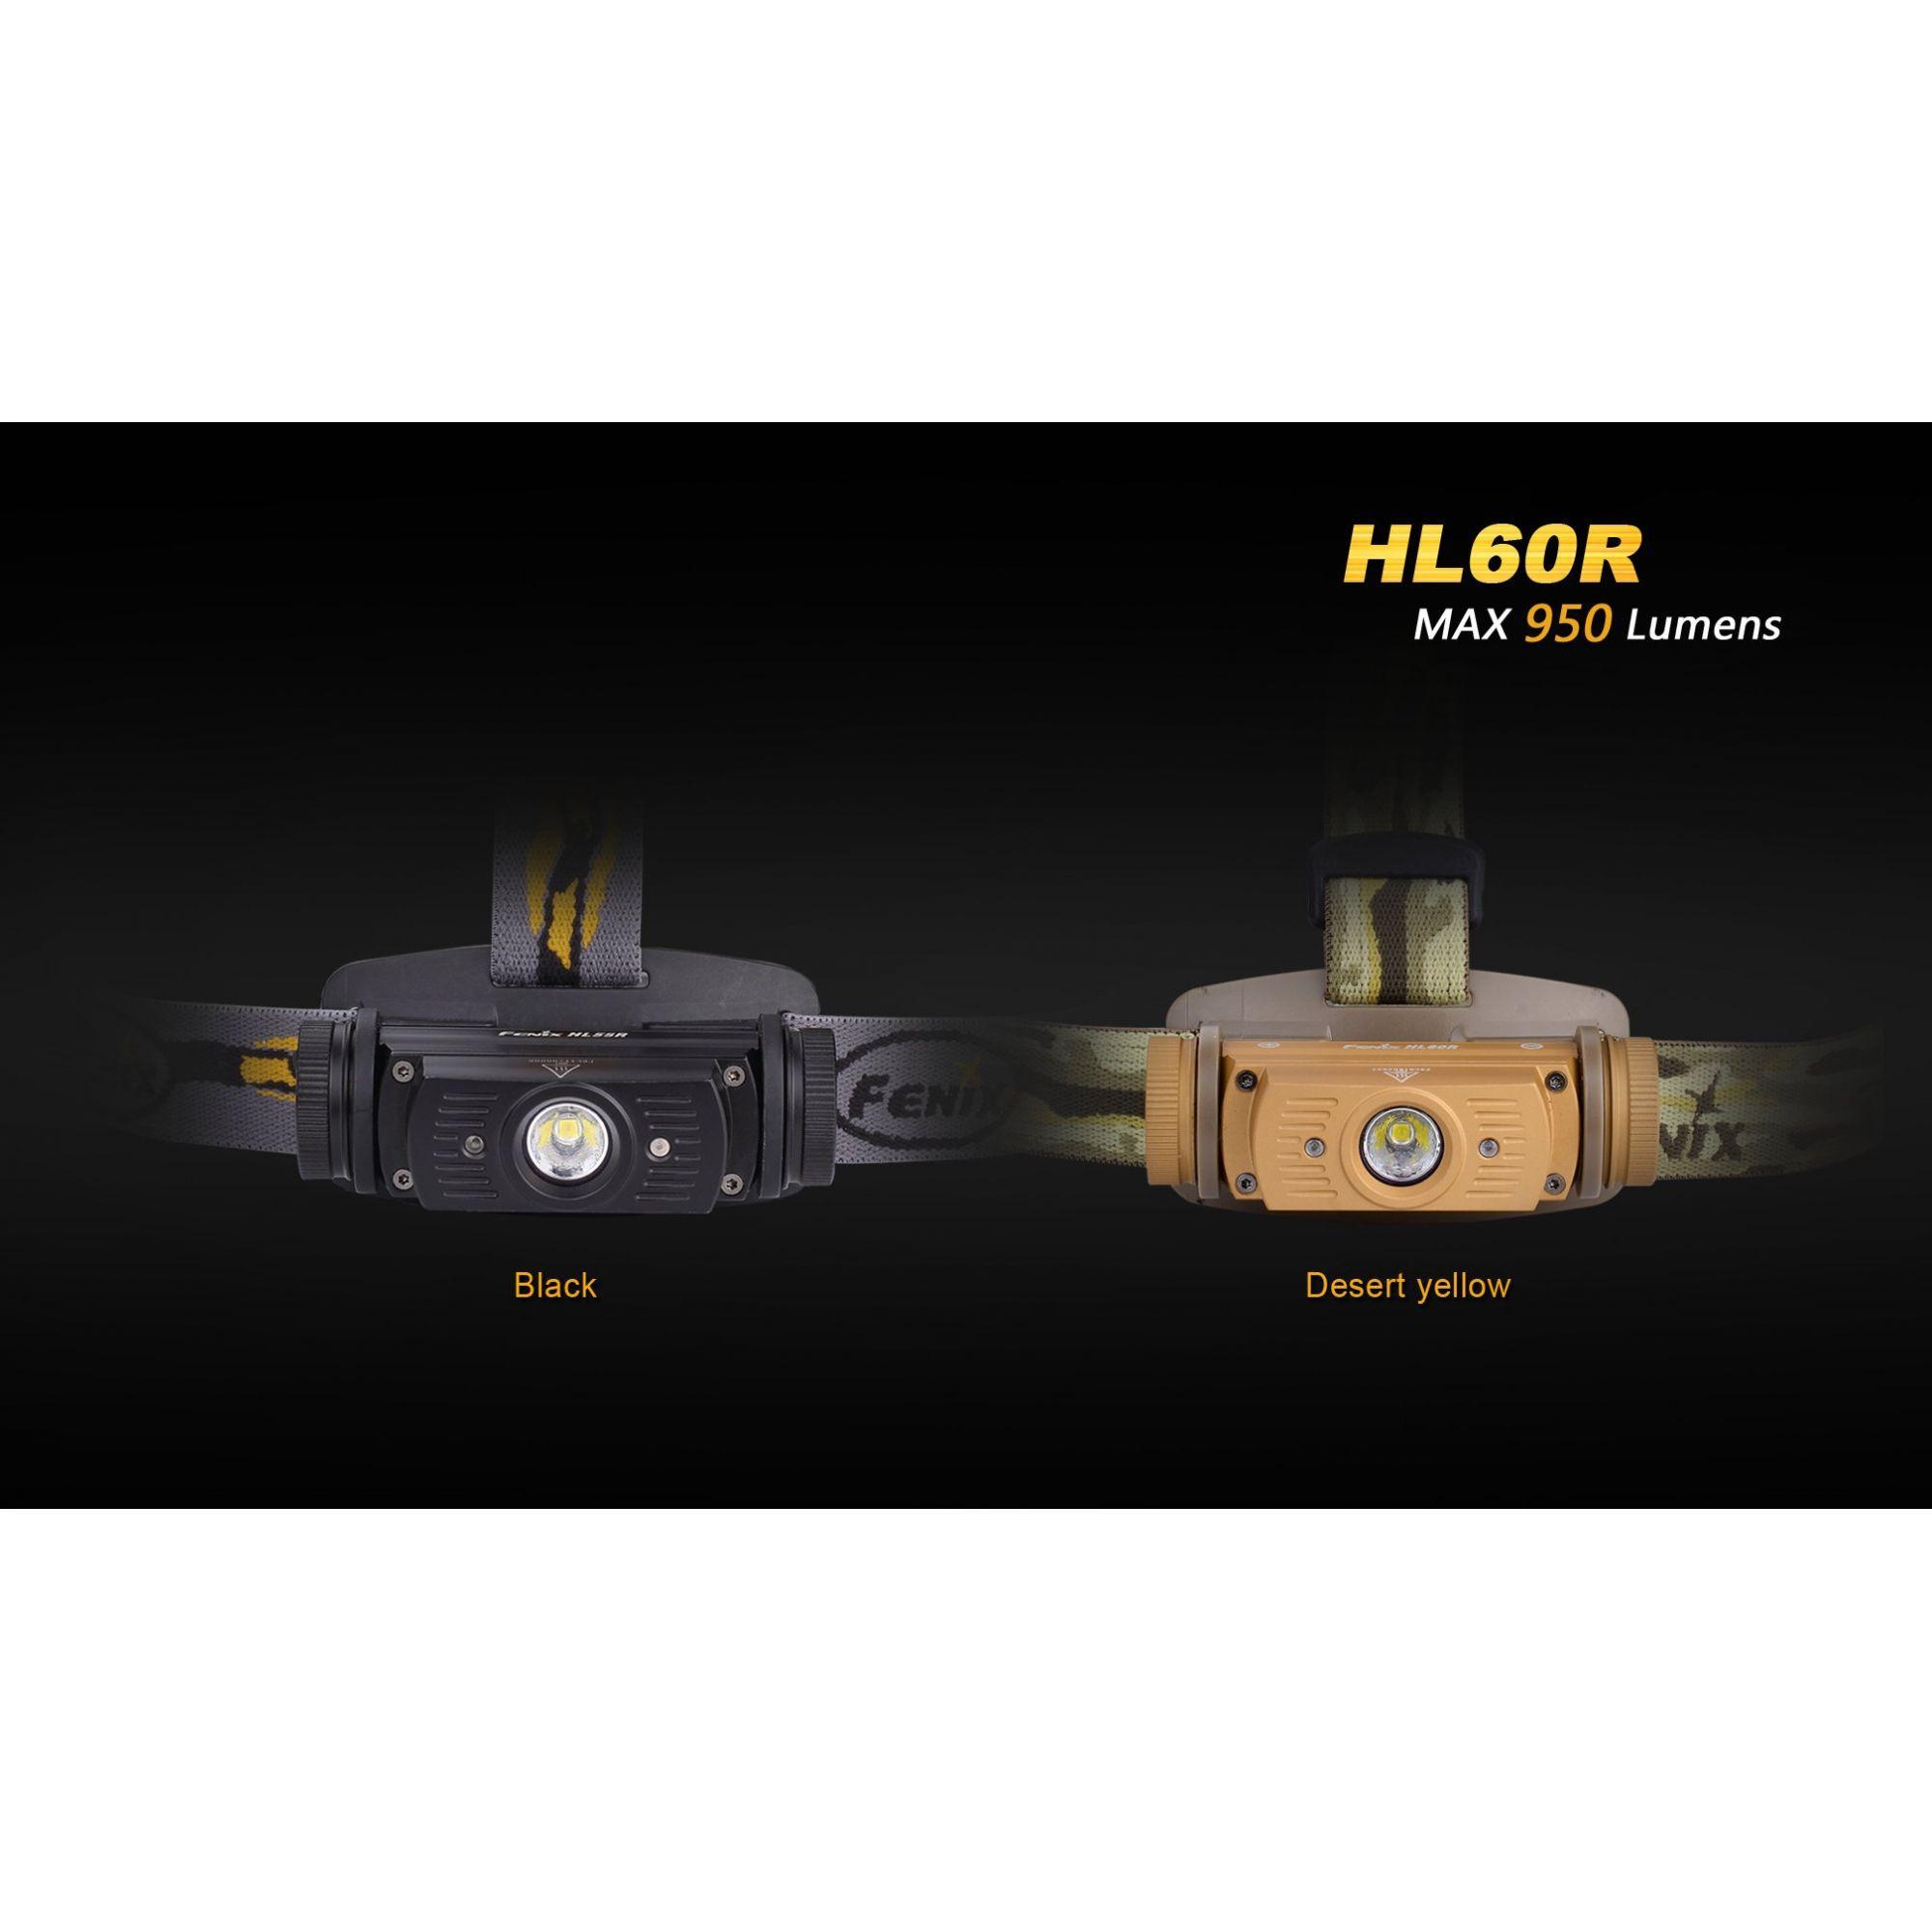 Lanterna Fenix HL60R Amarelo Desert 950 Lumens